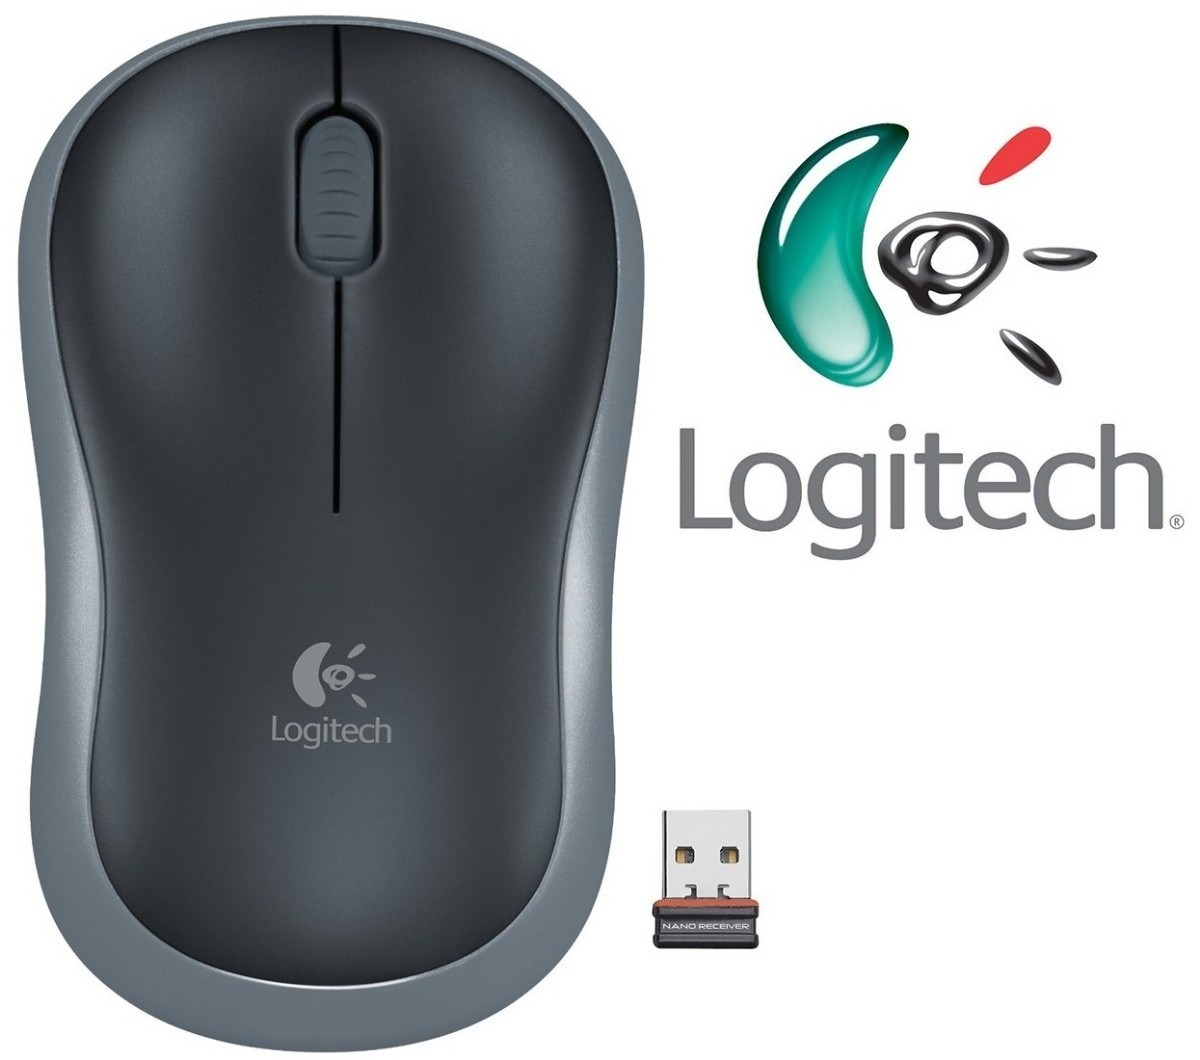 Logitech Wireless Mouse M185 (grijs) - afbeelding 1